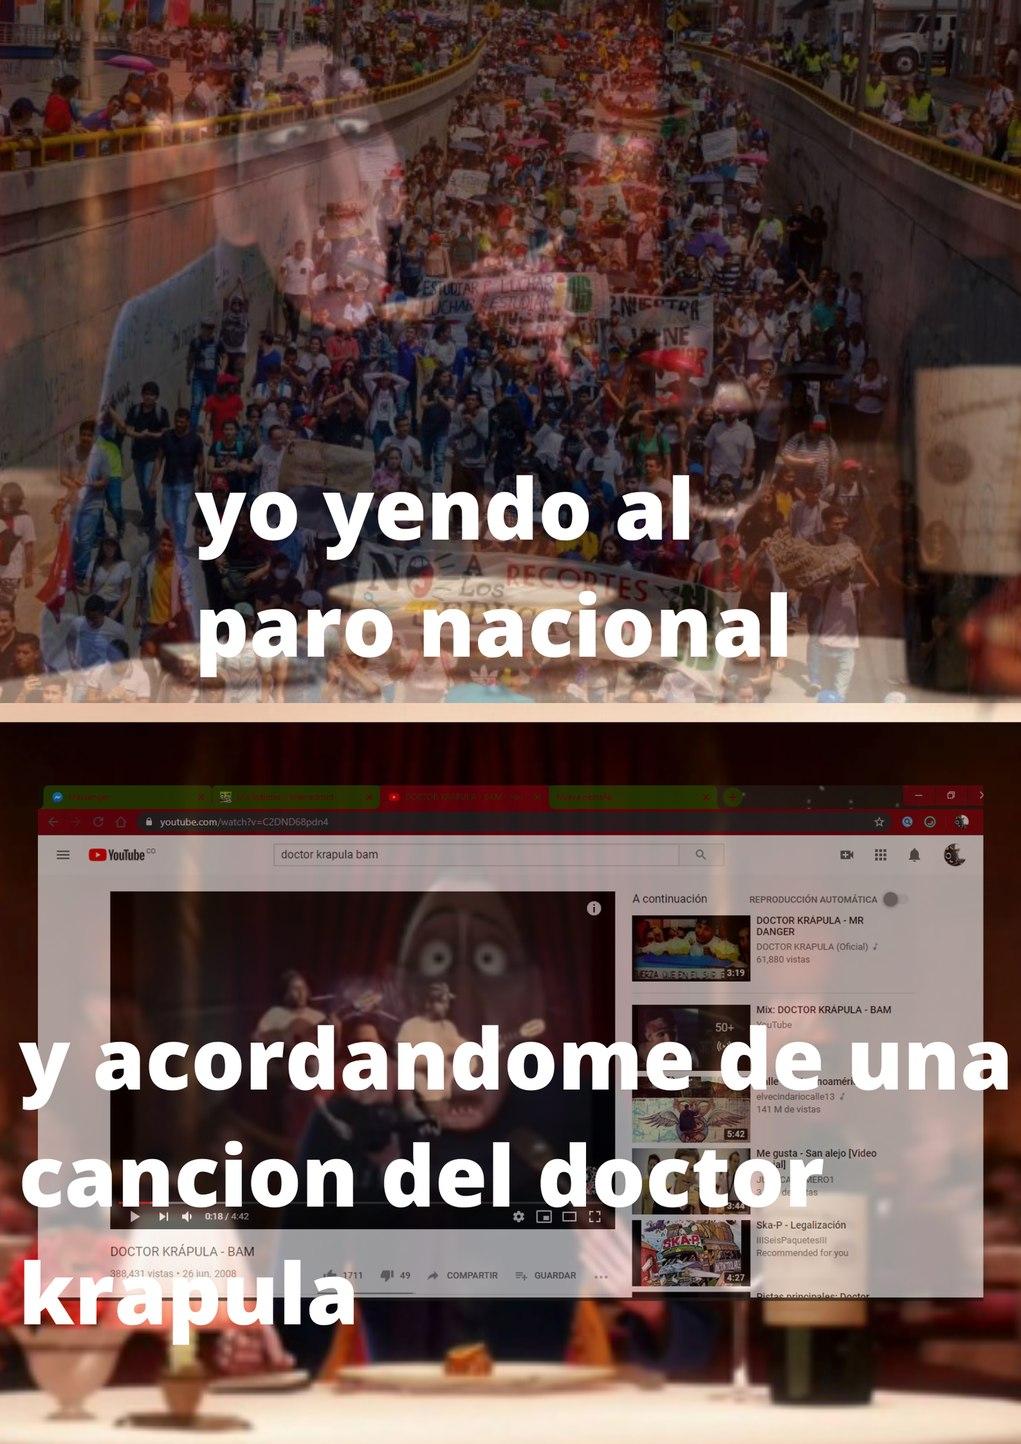 solo colombianos entenderan x 2 - meme